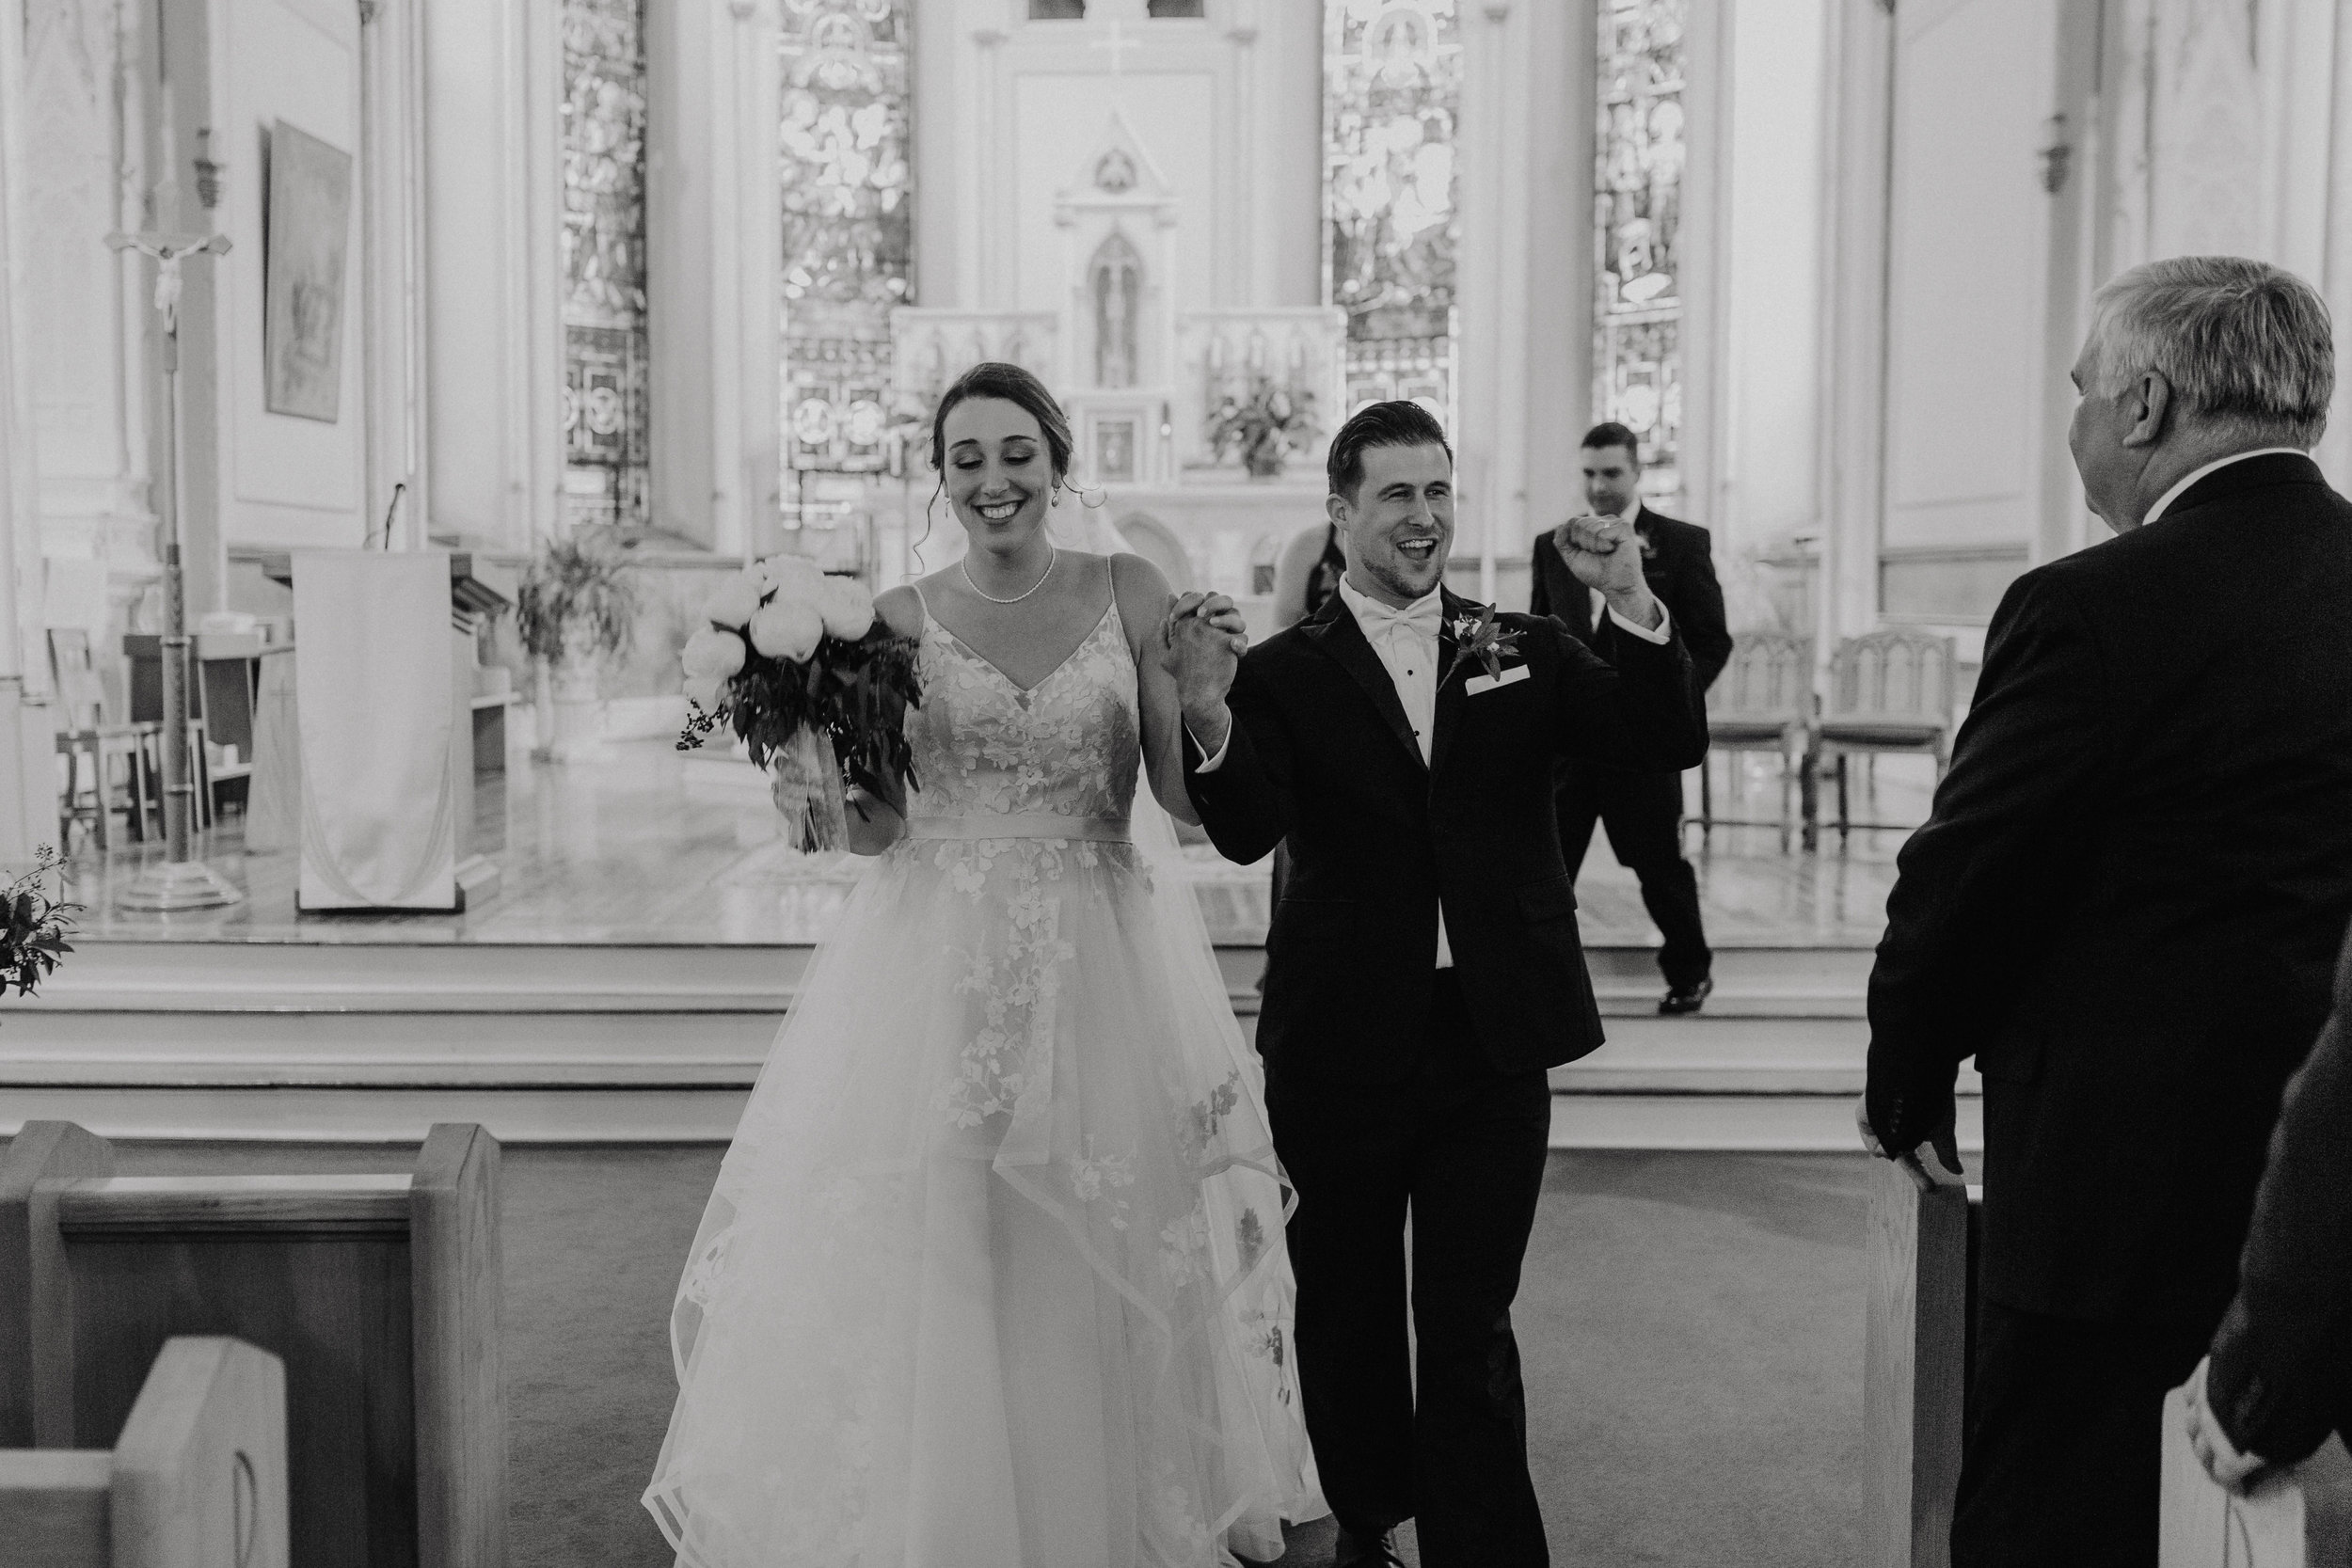 upstate_ny_wedding-31.jpg